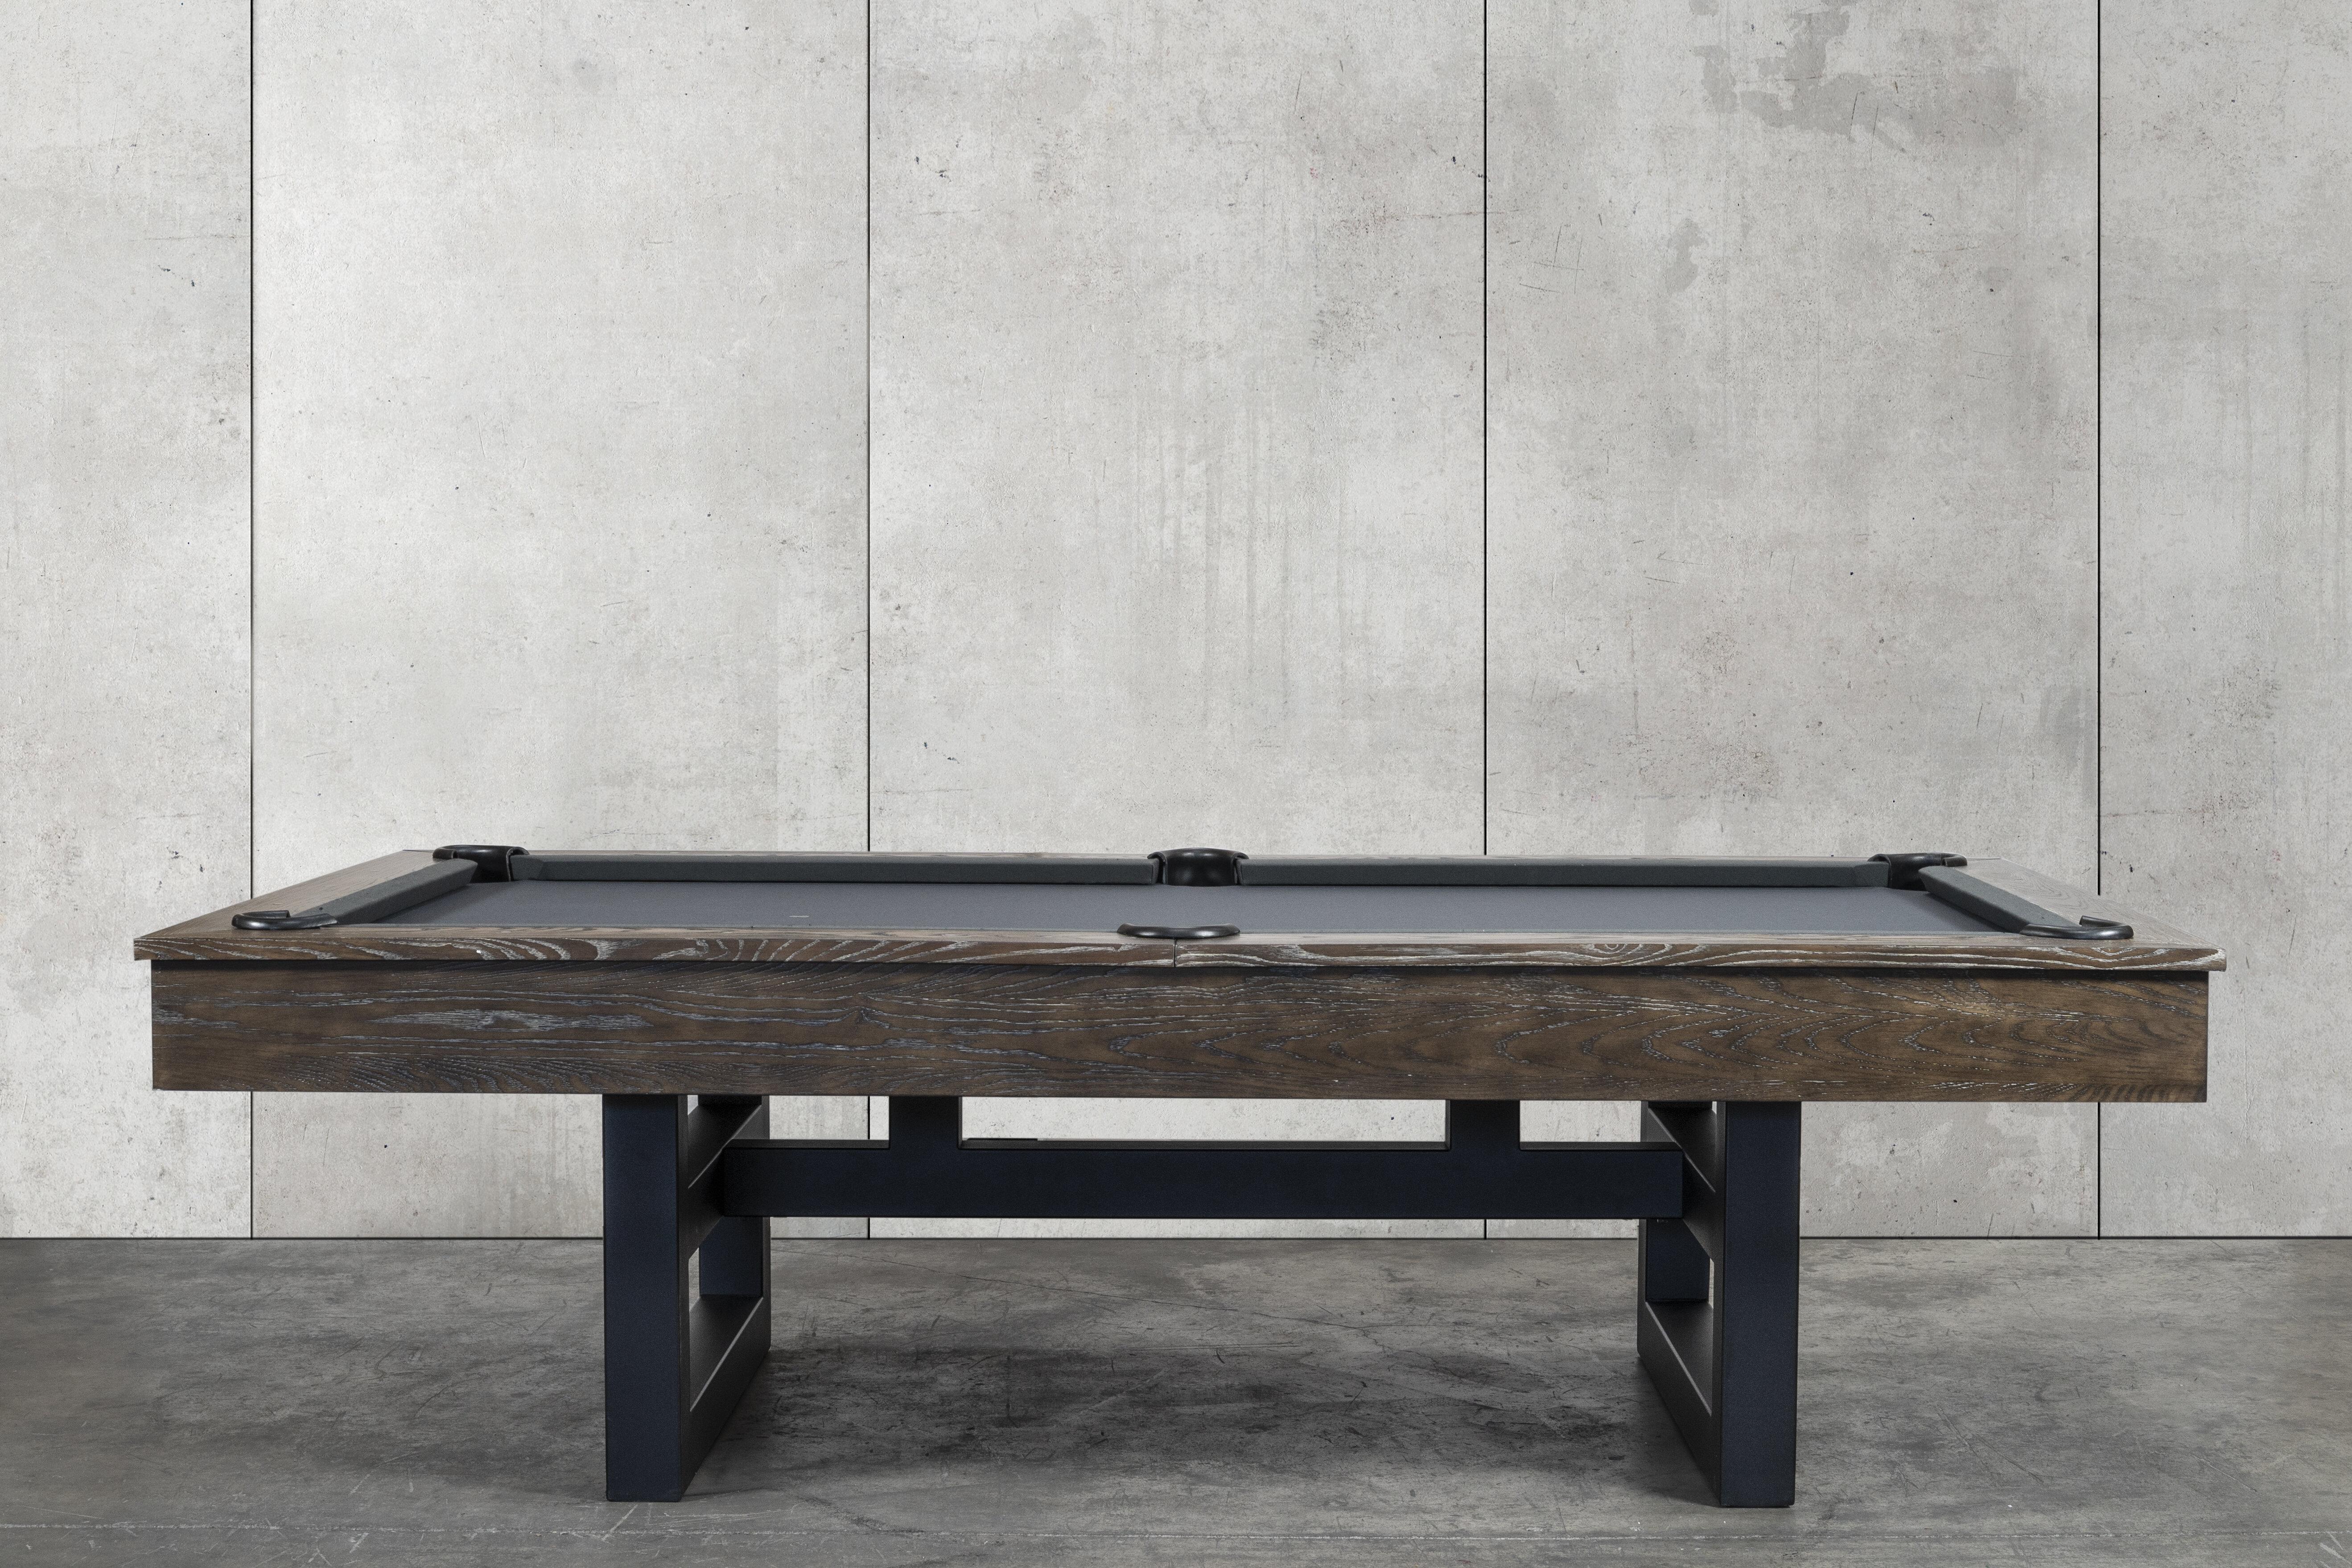 Nixon Billiards Mckay 8 Slate Pool Table With Professional Installation Included Wayfair